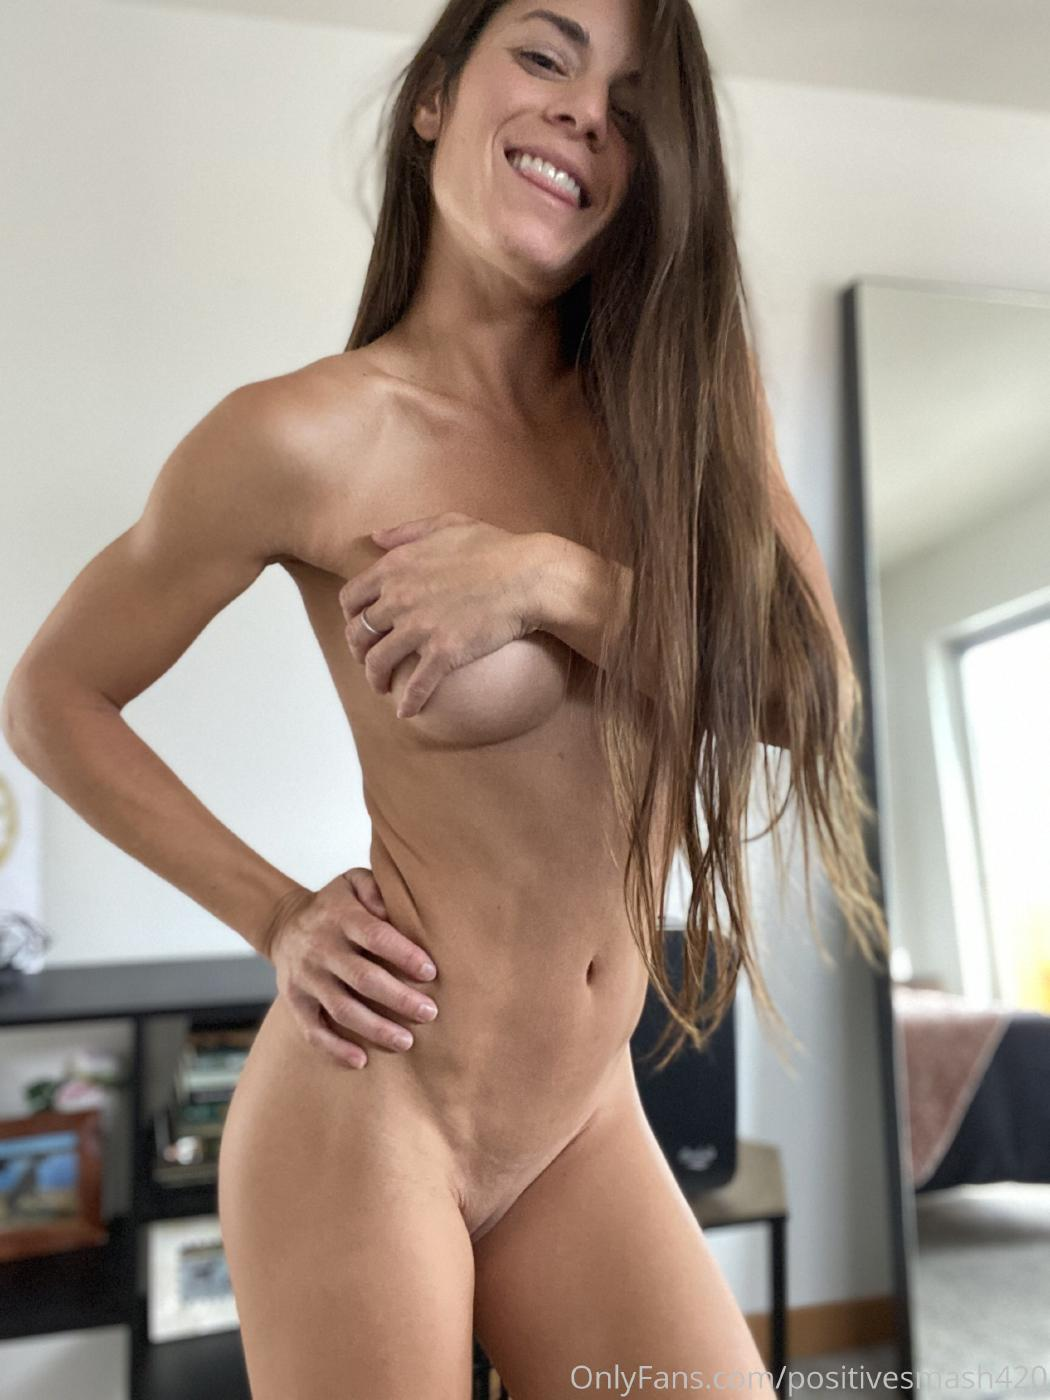 Positive Smash Nude Bikini Strip Onlyfans Set Leaked 0009